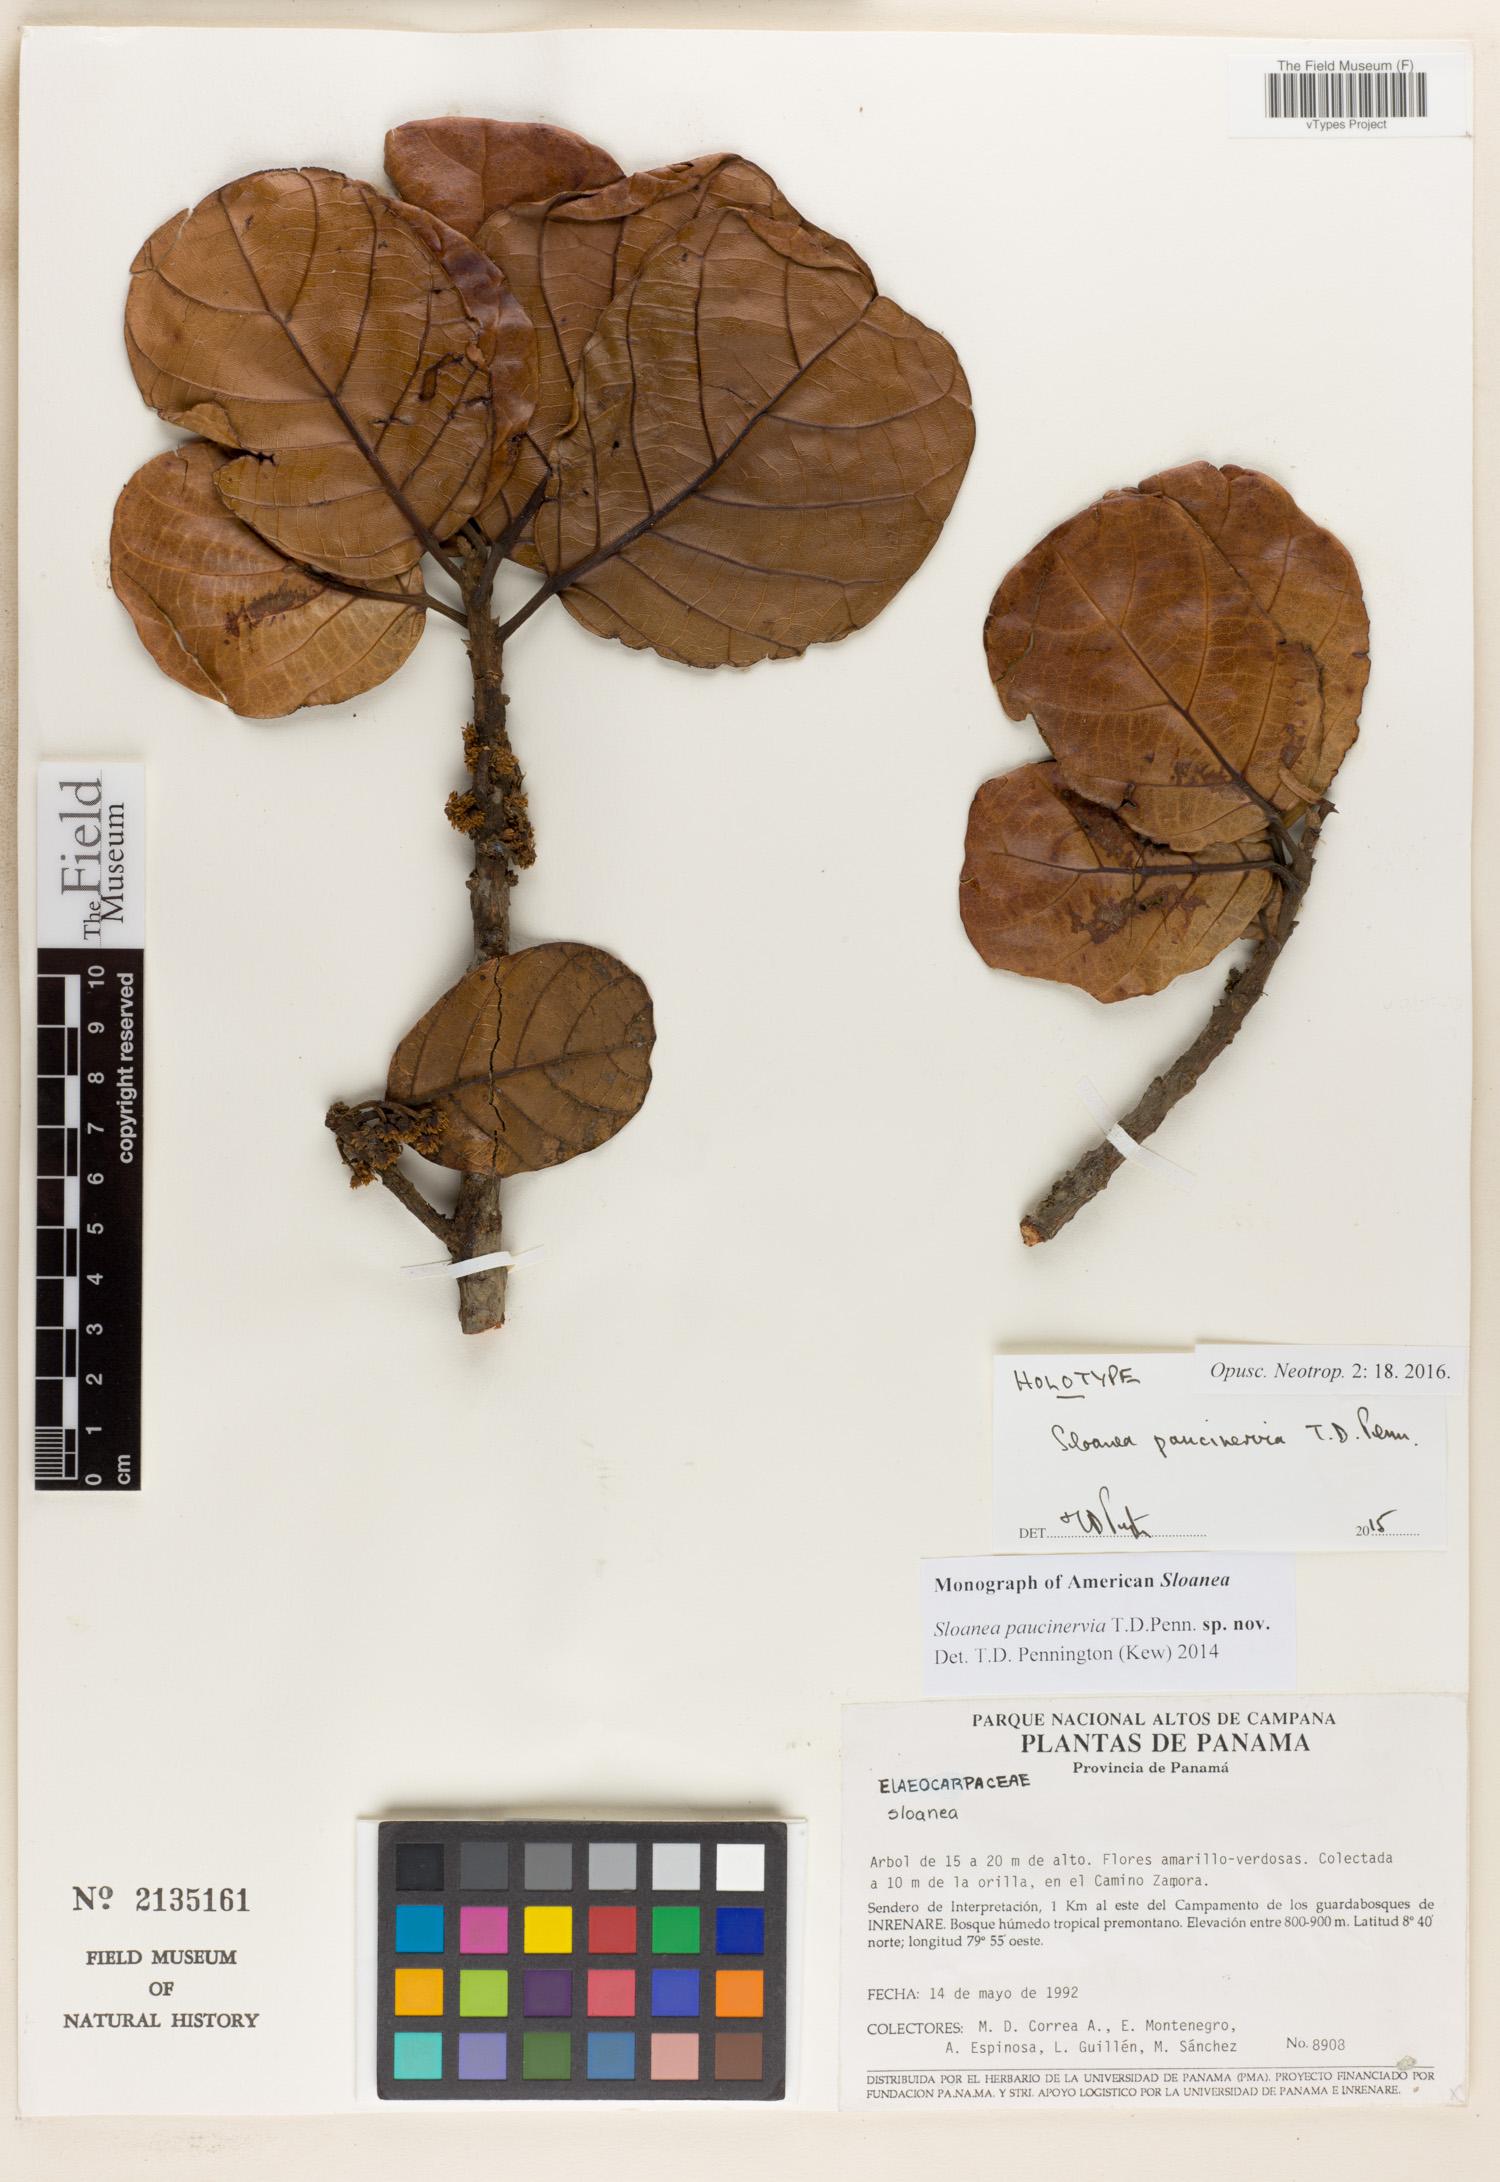 Specimen: Sloanea paucinervia